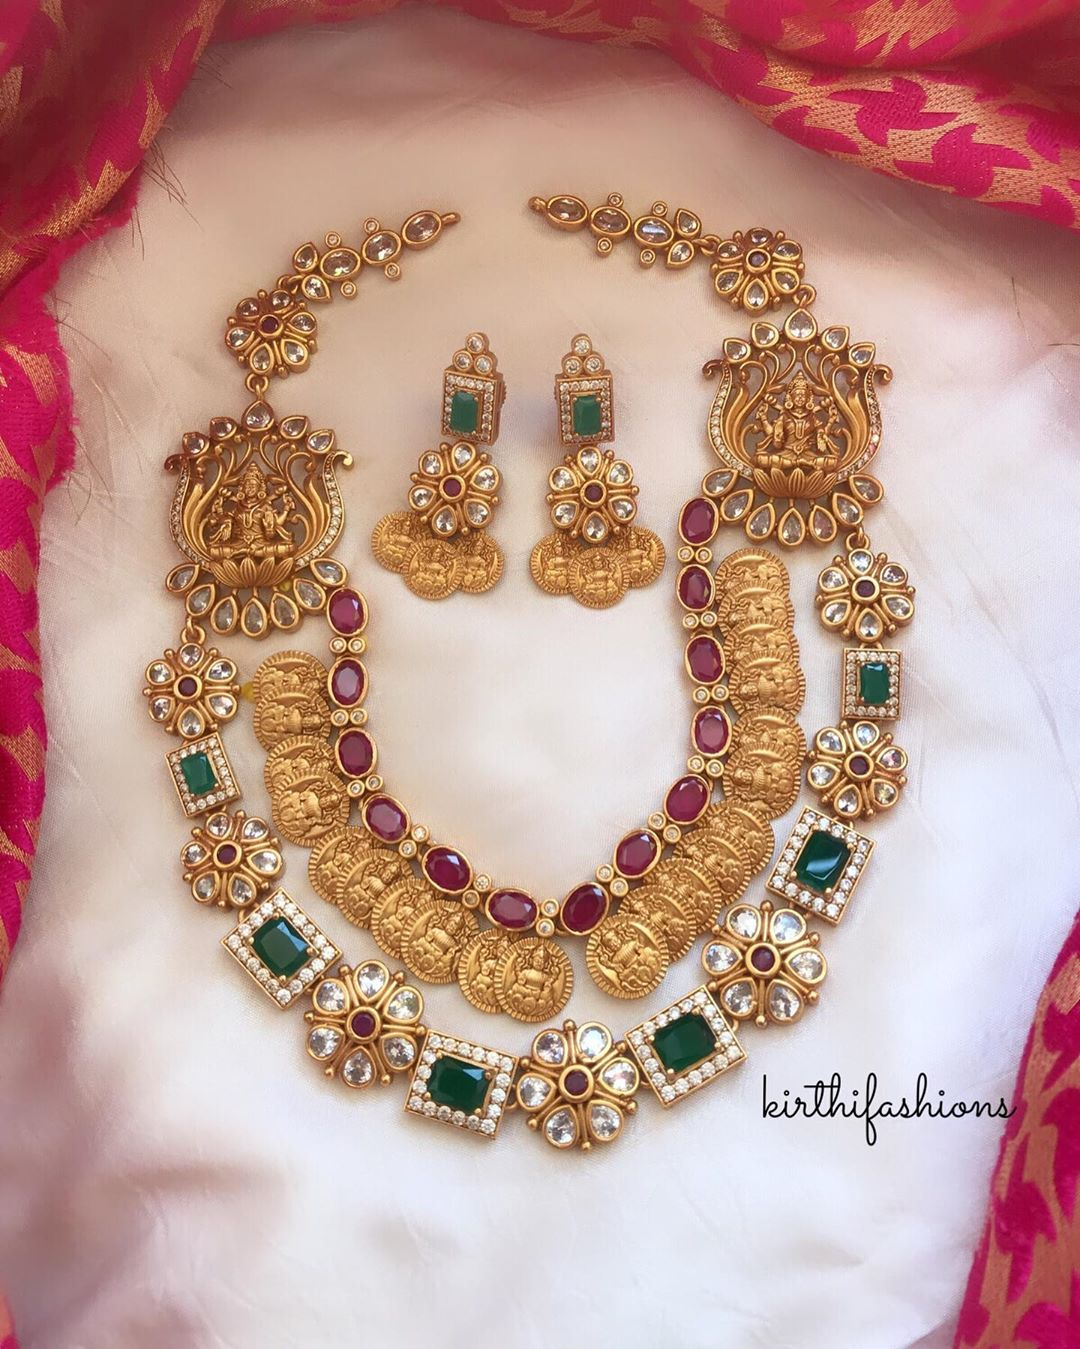 imitation-jewellery-online-shopping-4